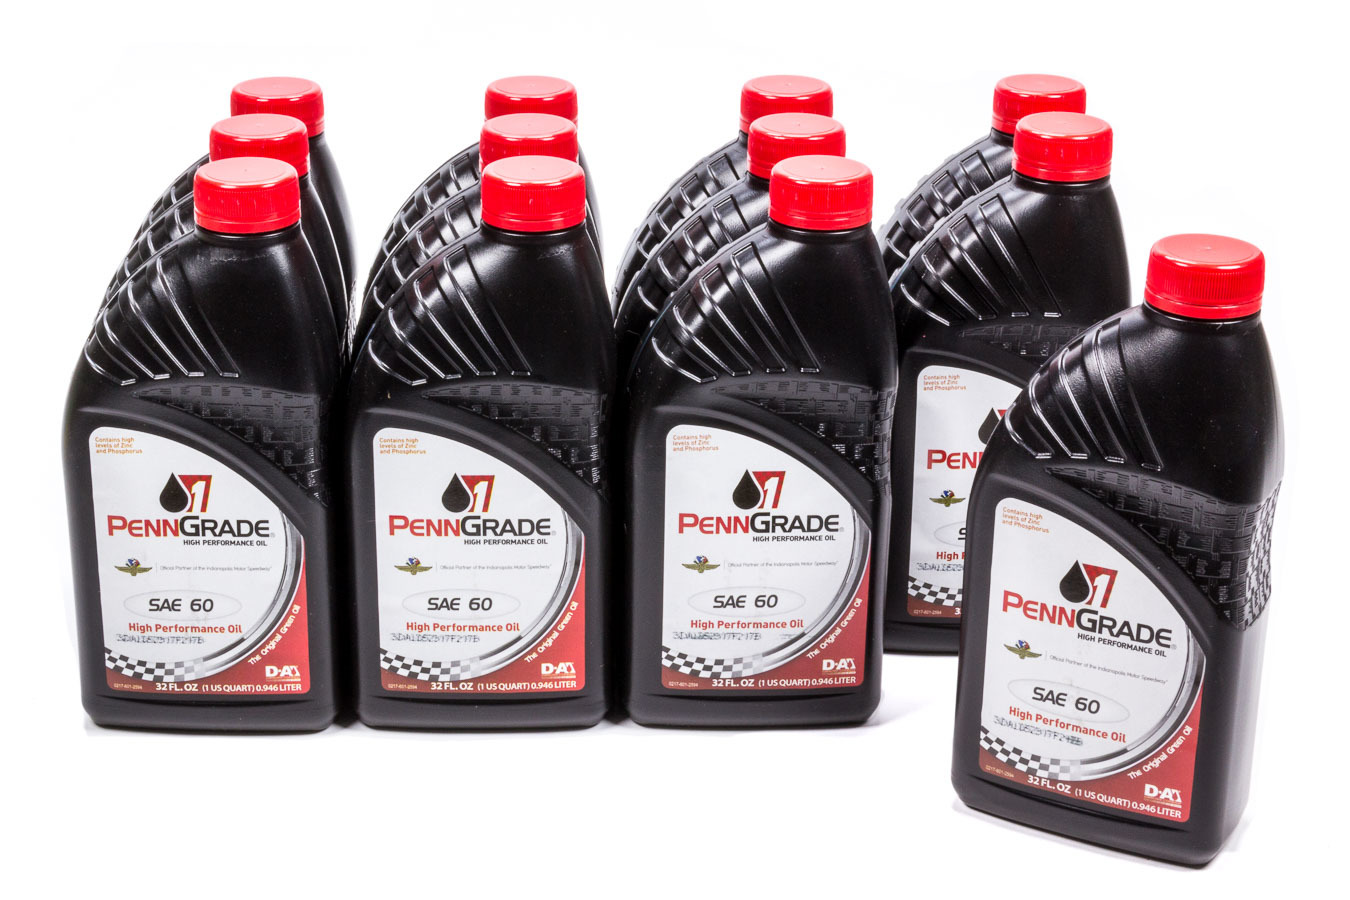 Penngrade Motor Oil 71166-12 Motor Oil, High Zinc, 60W, Conventional, 1 qt, Set of 12